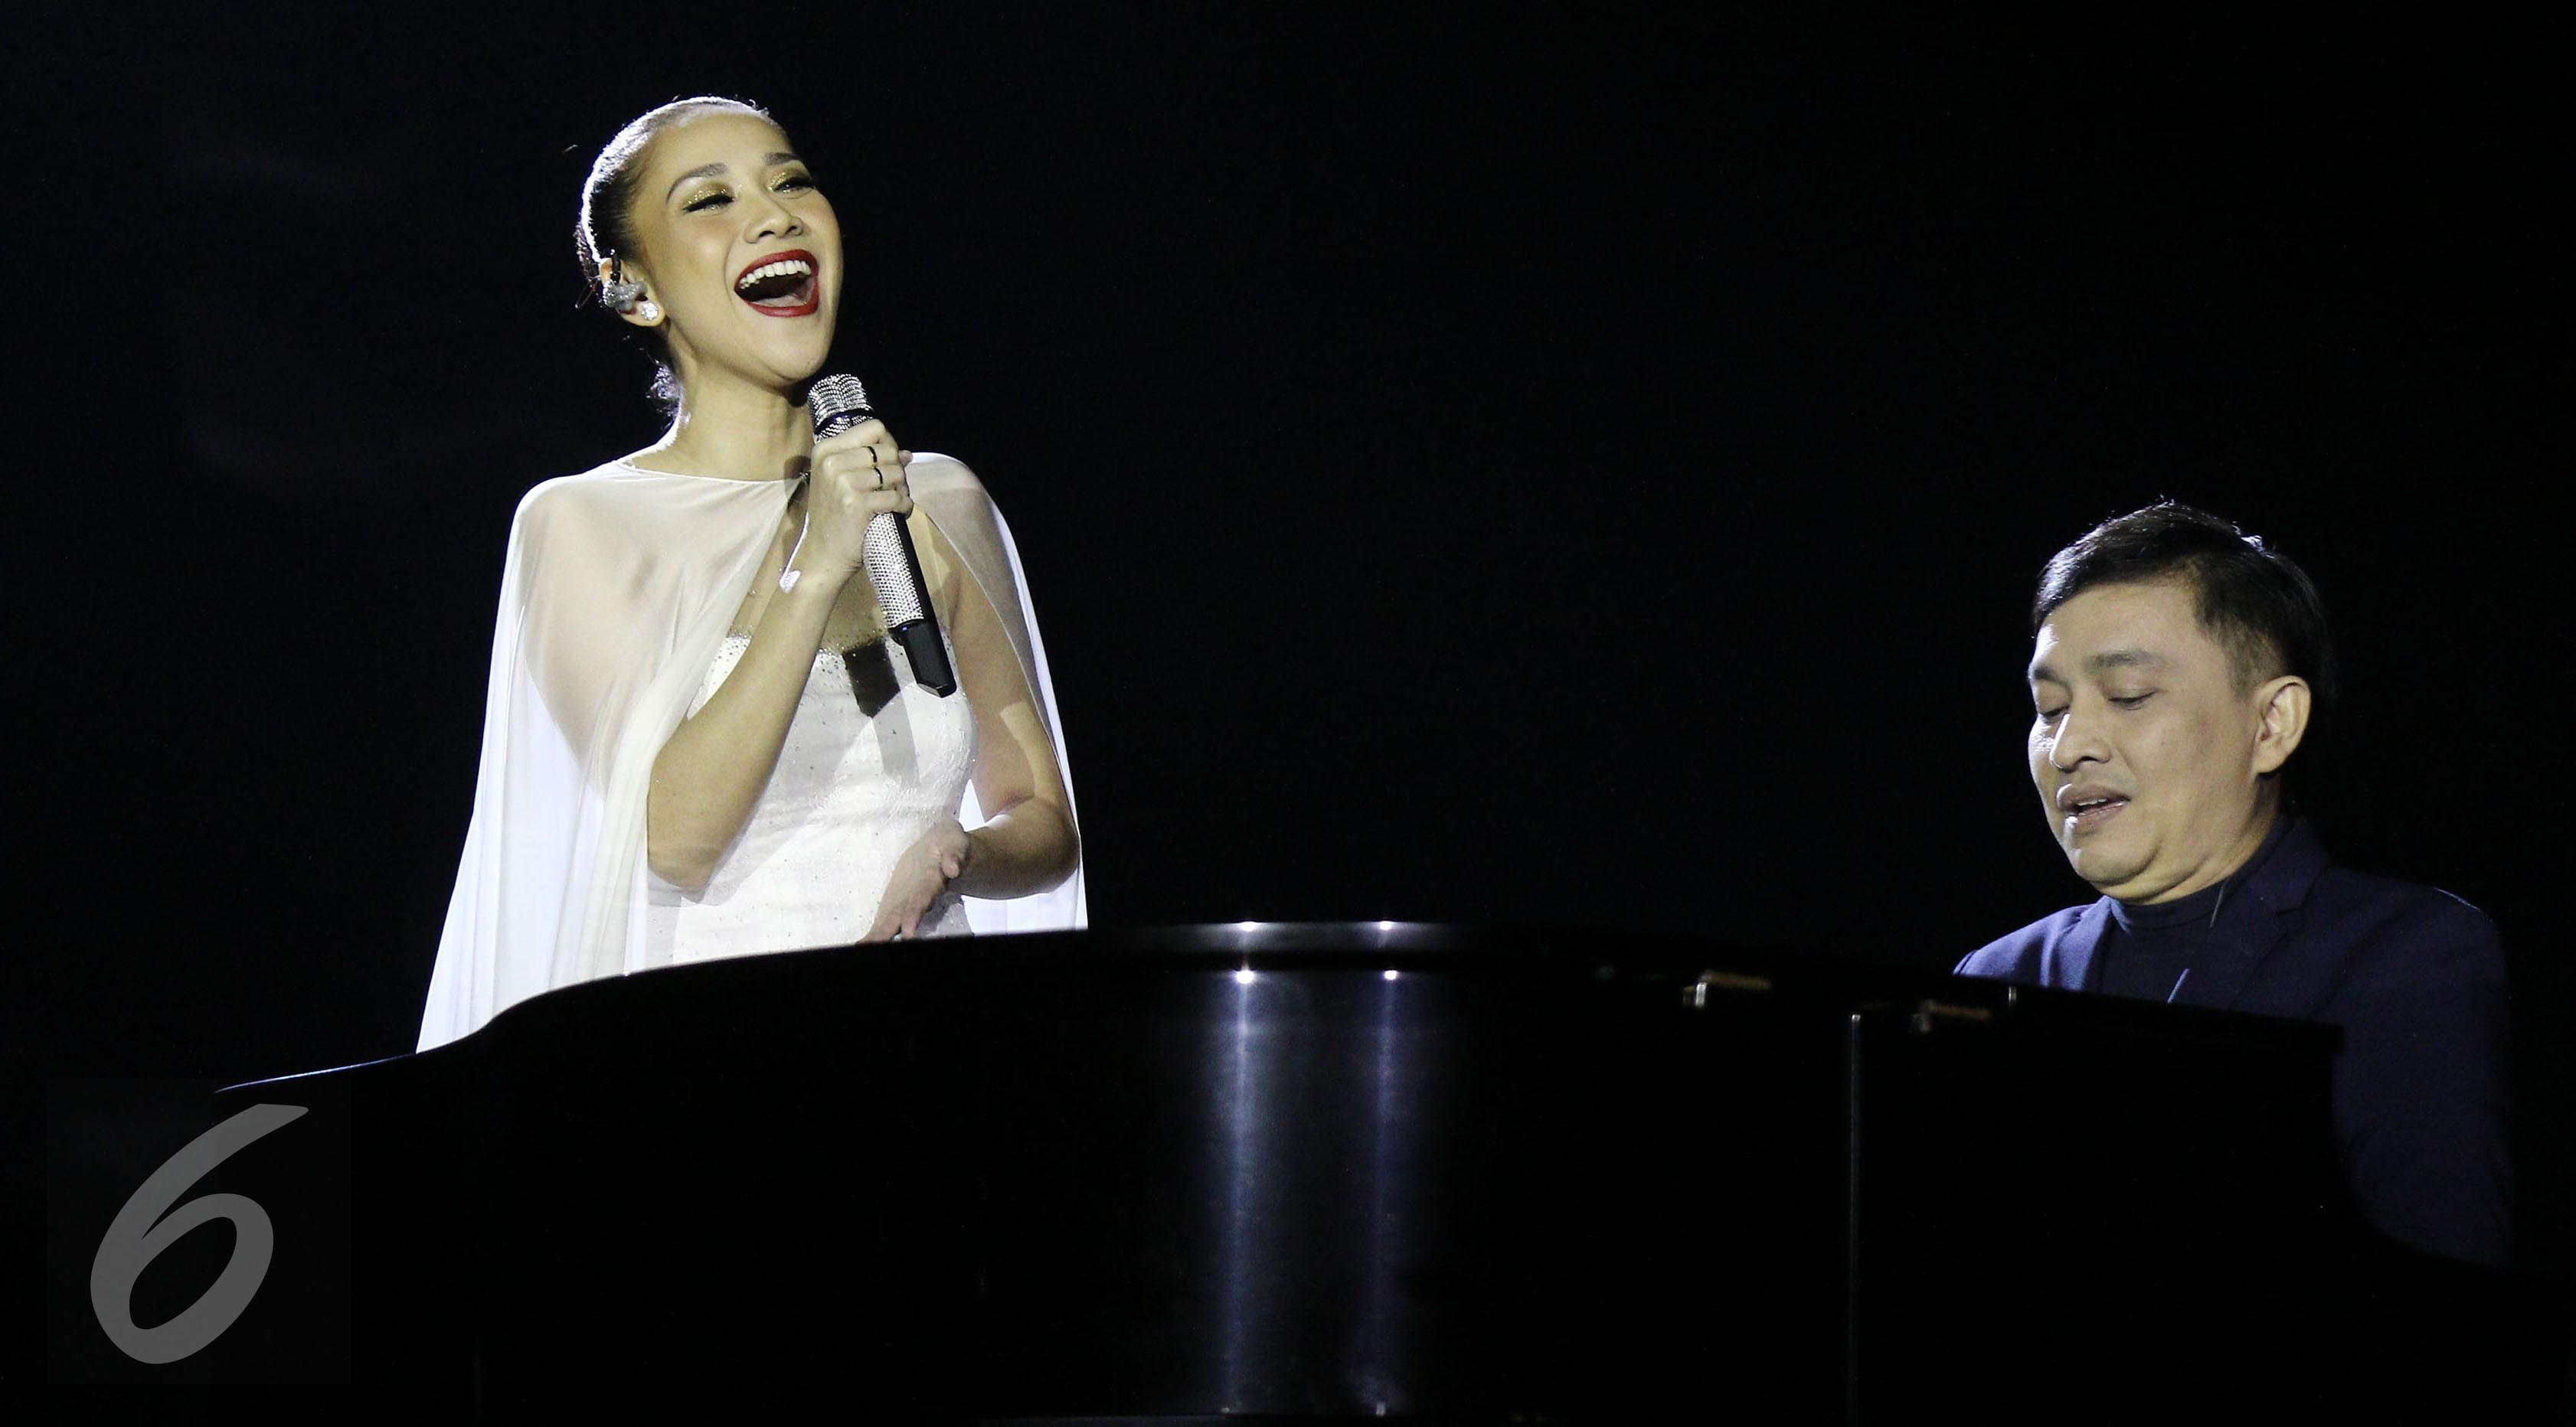 Penampilan Bunga Citra Lestari bersama Yovie Widianto dalam konser tunggalnya bertajuk